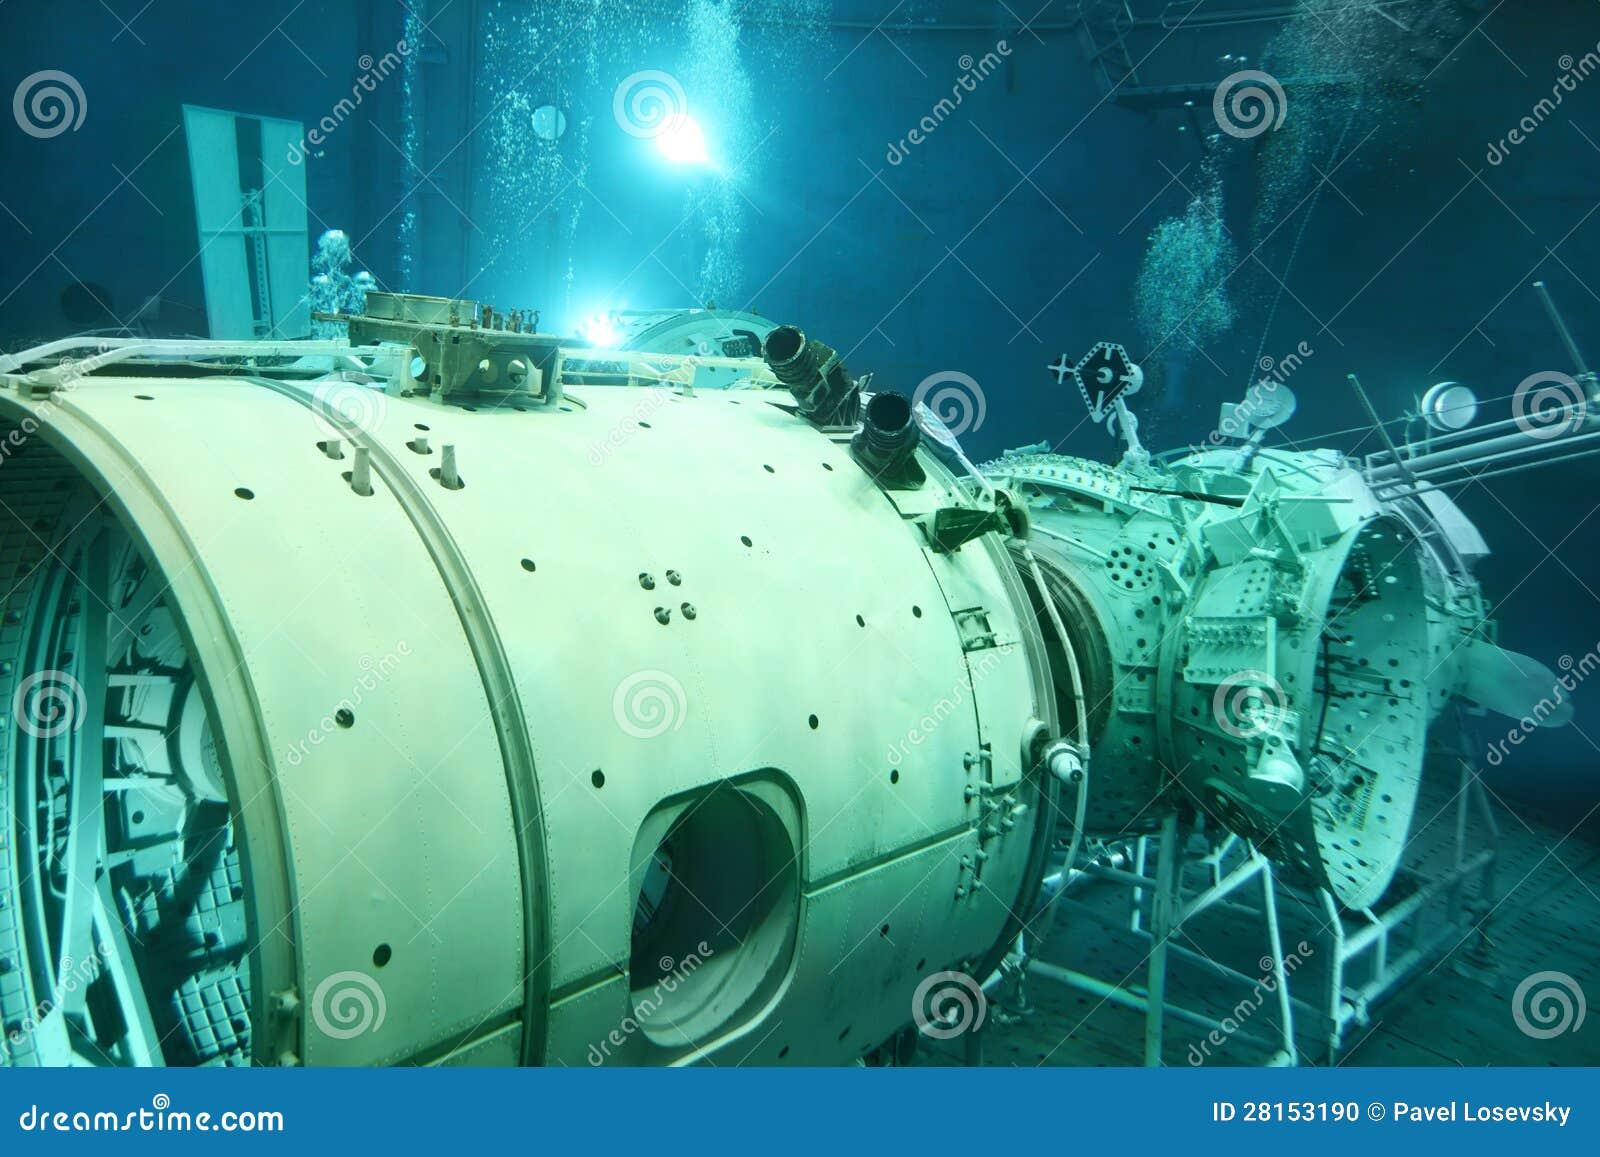 Underwater Space Simulator Editorial Image - Image: 28153190